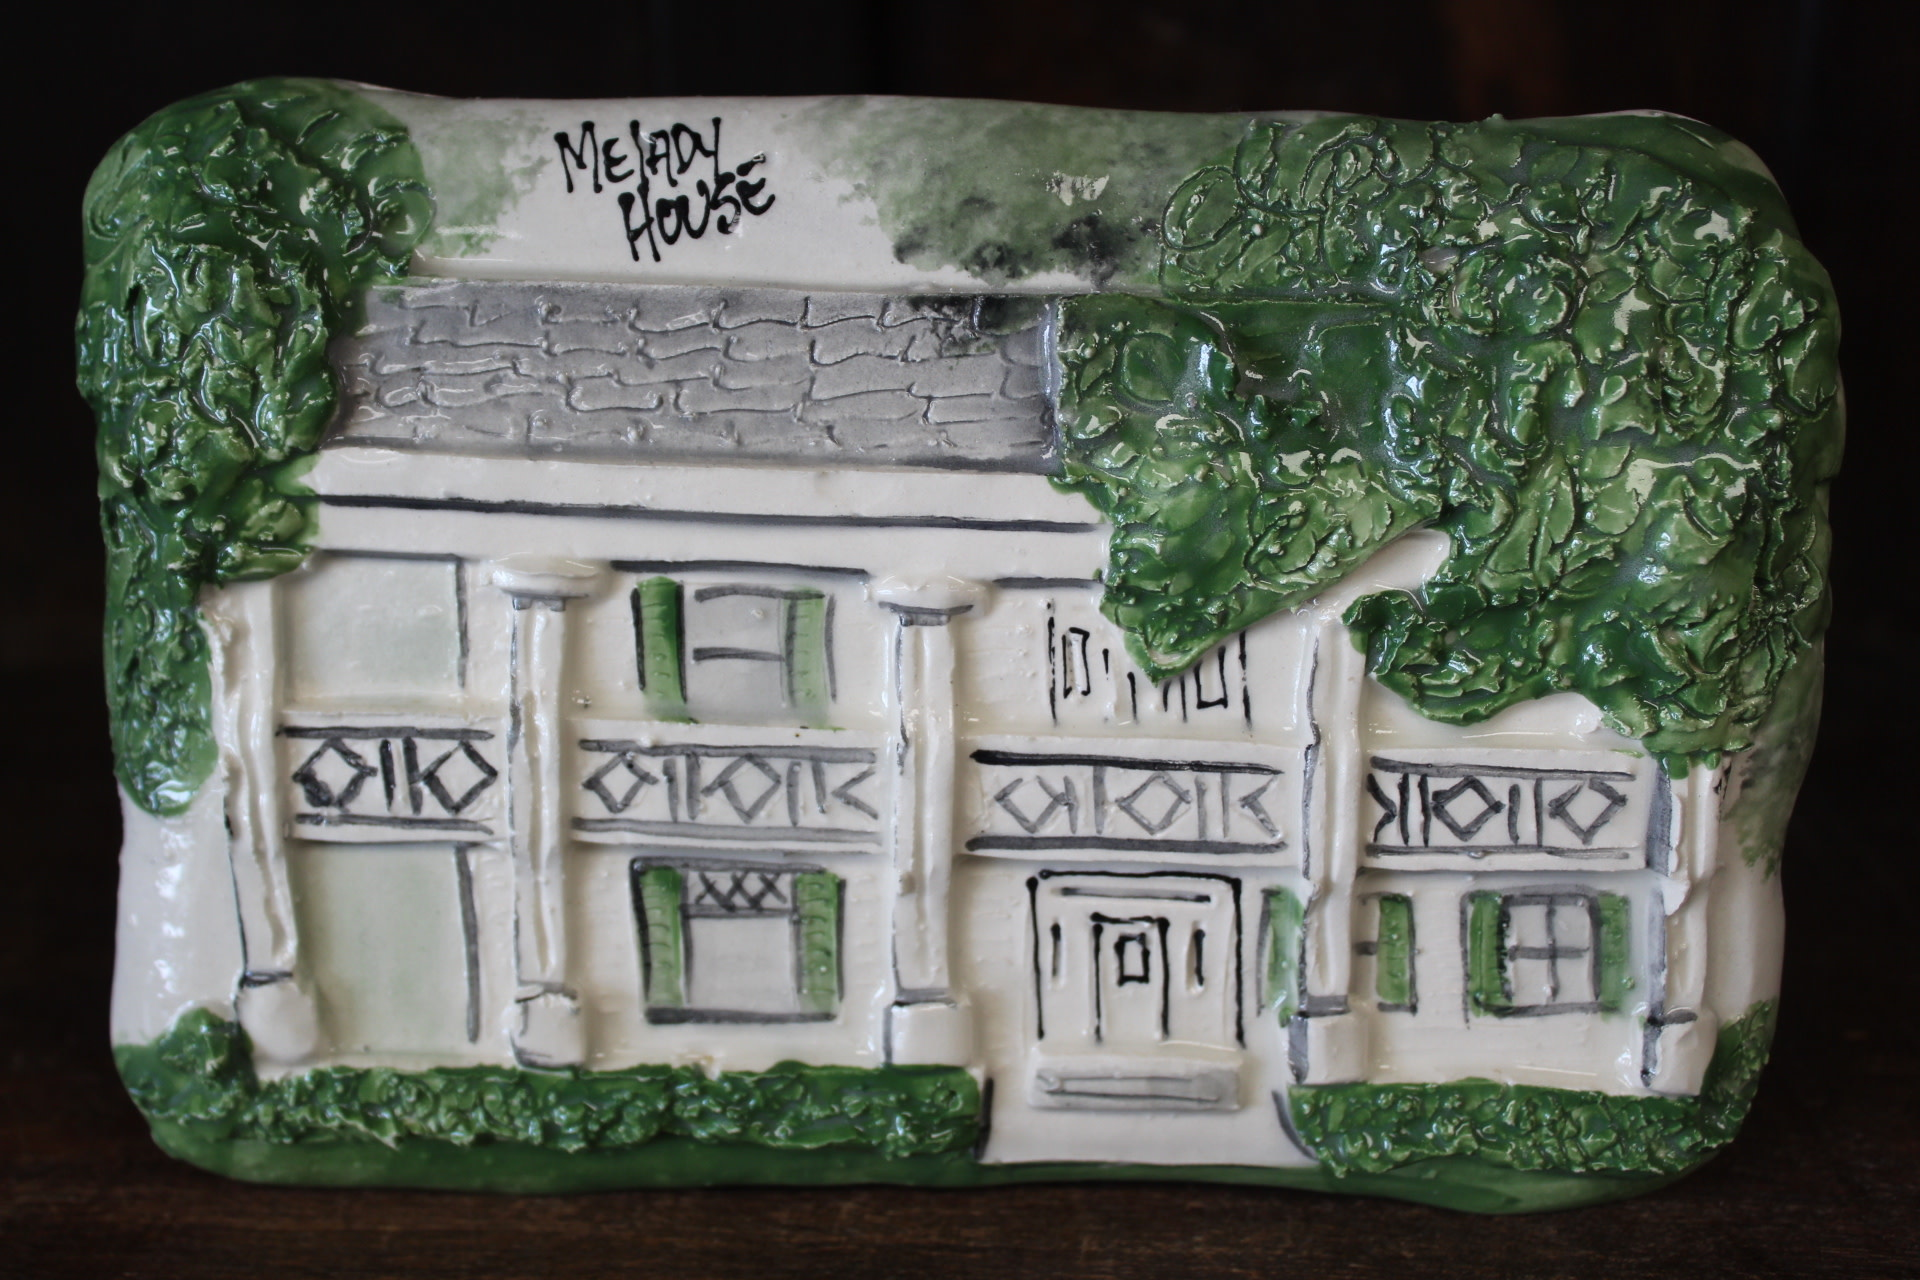 Architectural Memories Melady House Plaque